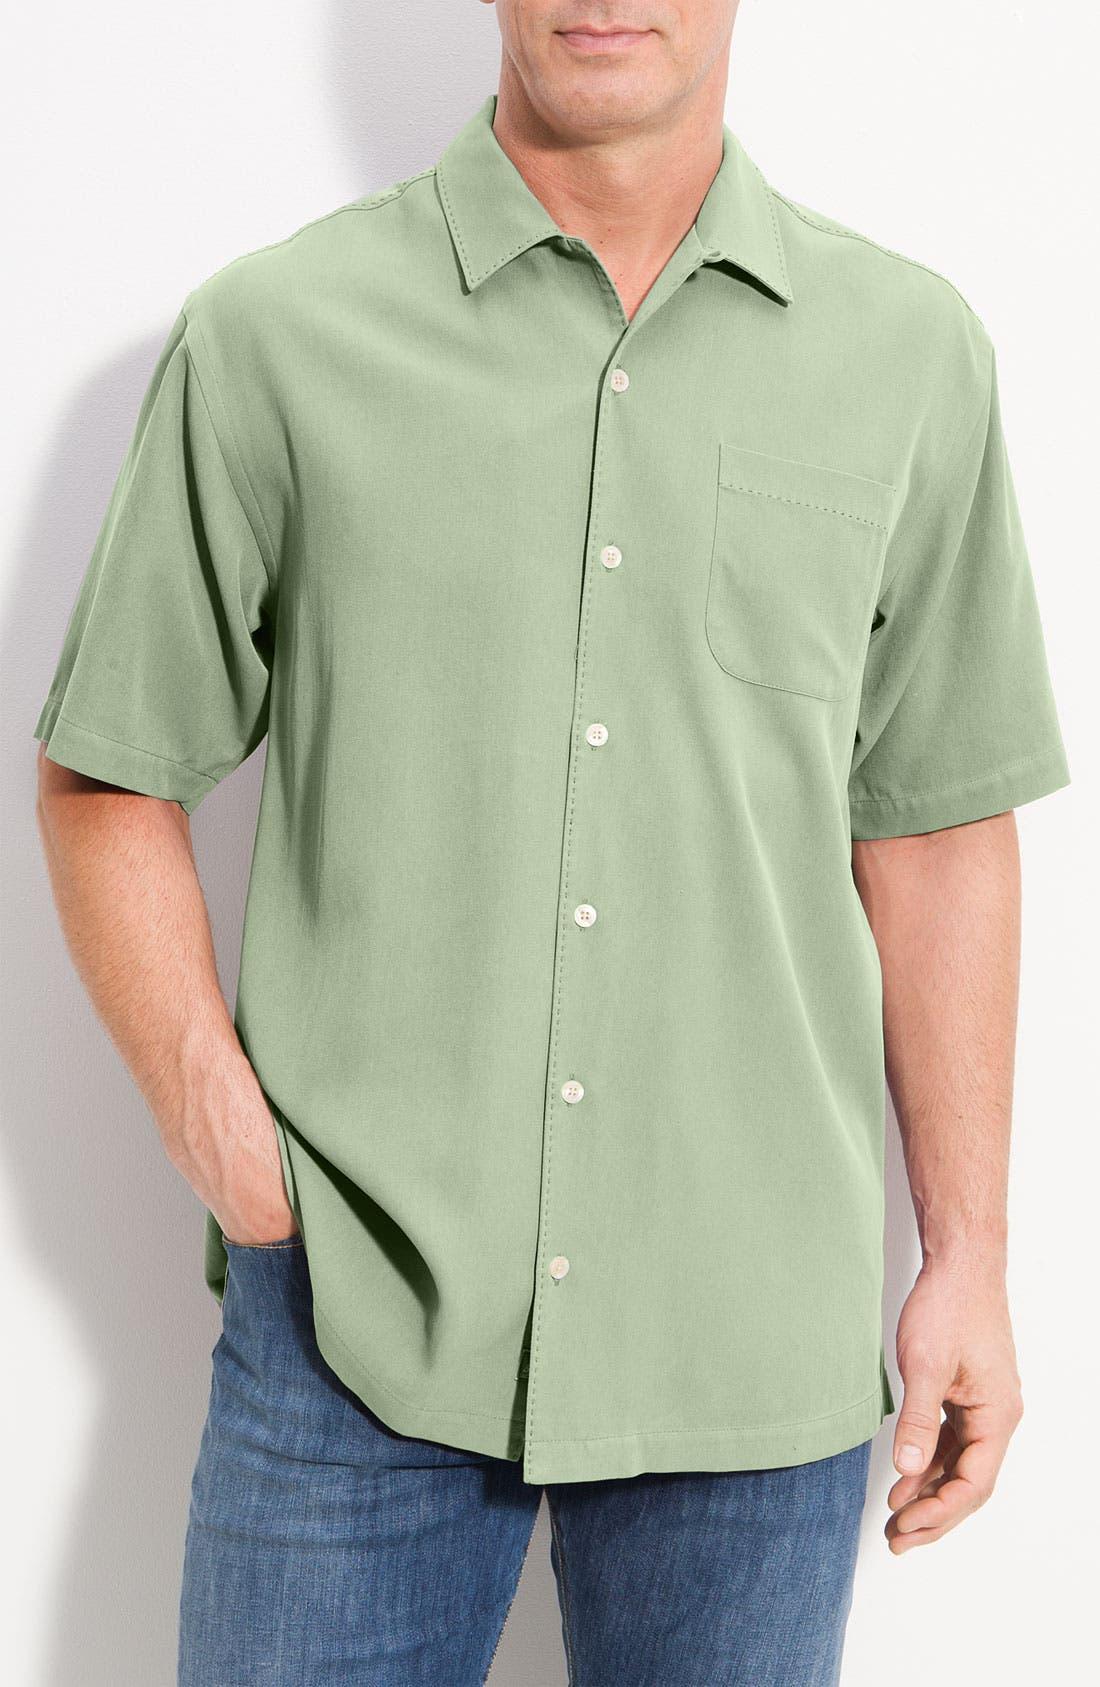 Alternate Image 1 Selected - Tommy Bahama 'Catalina Twill' Silk Camp Shirt (Big & Tall)